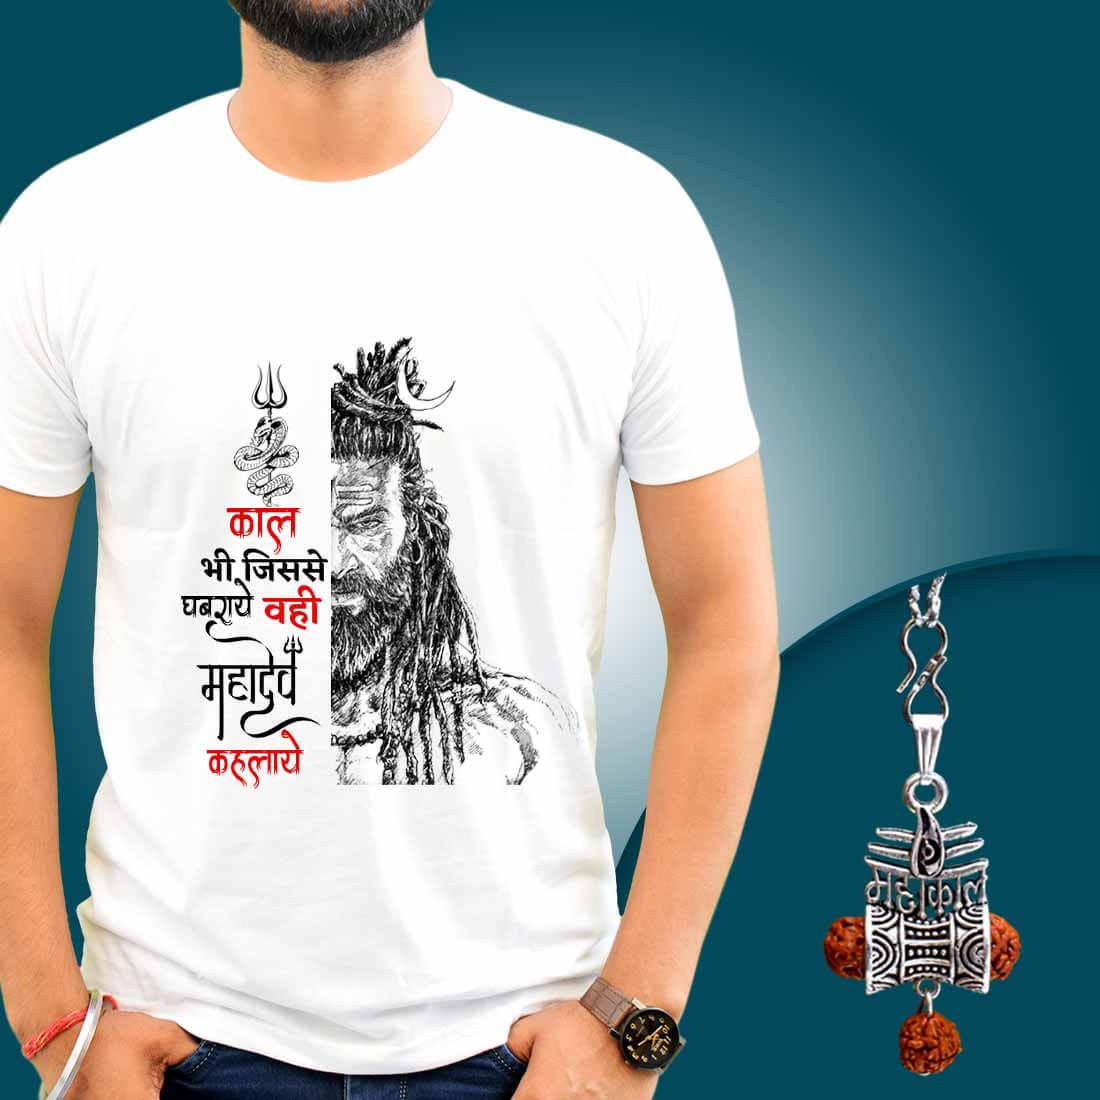 Mahakal Printed T Shirt Combo With Mahakal Locket